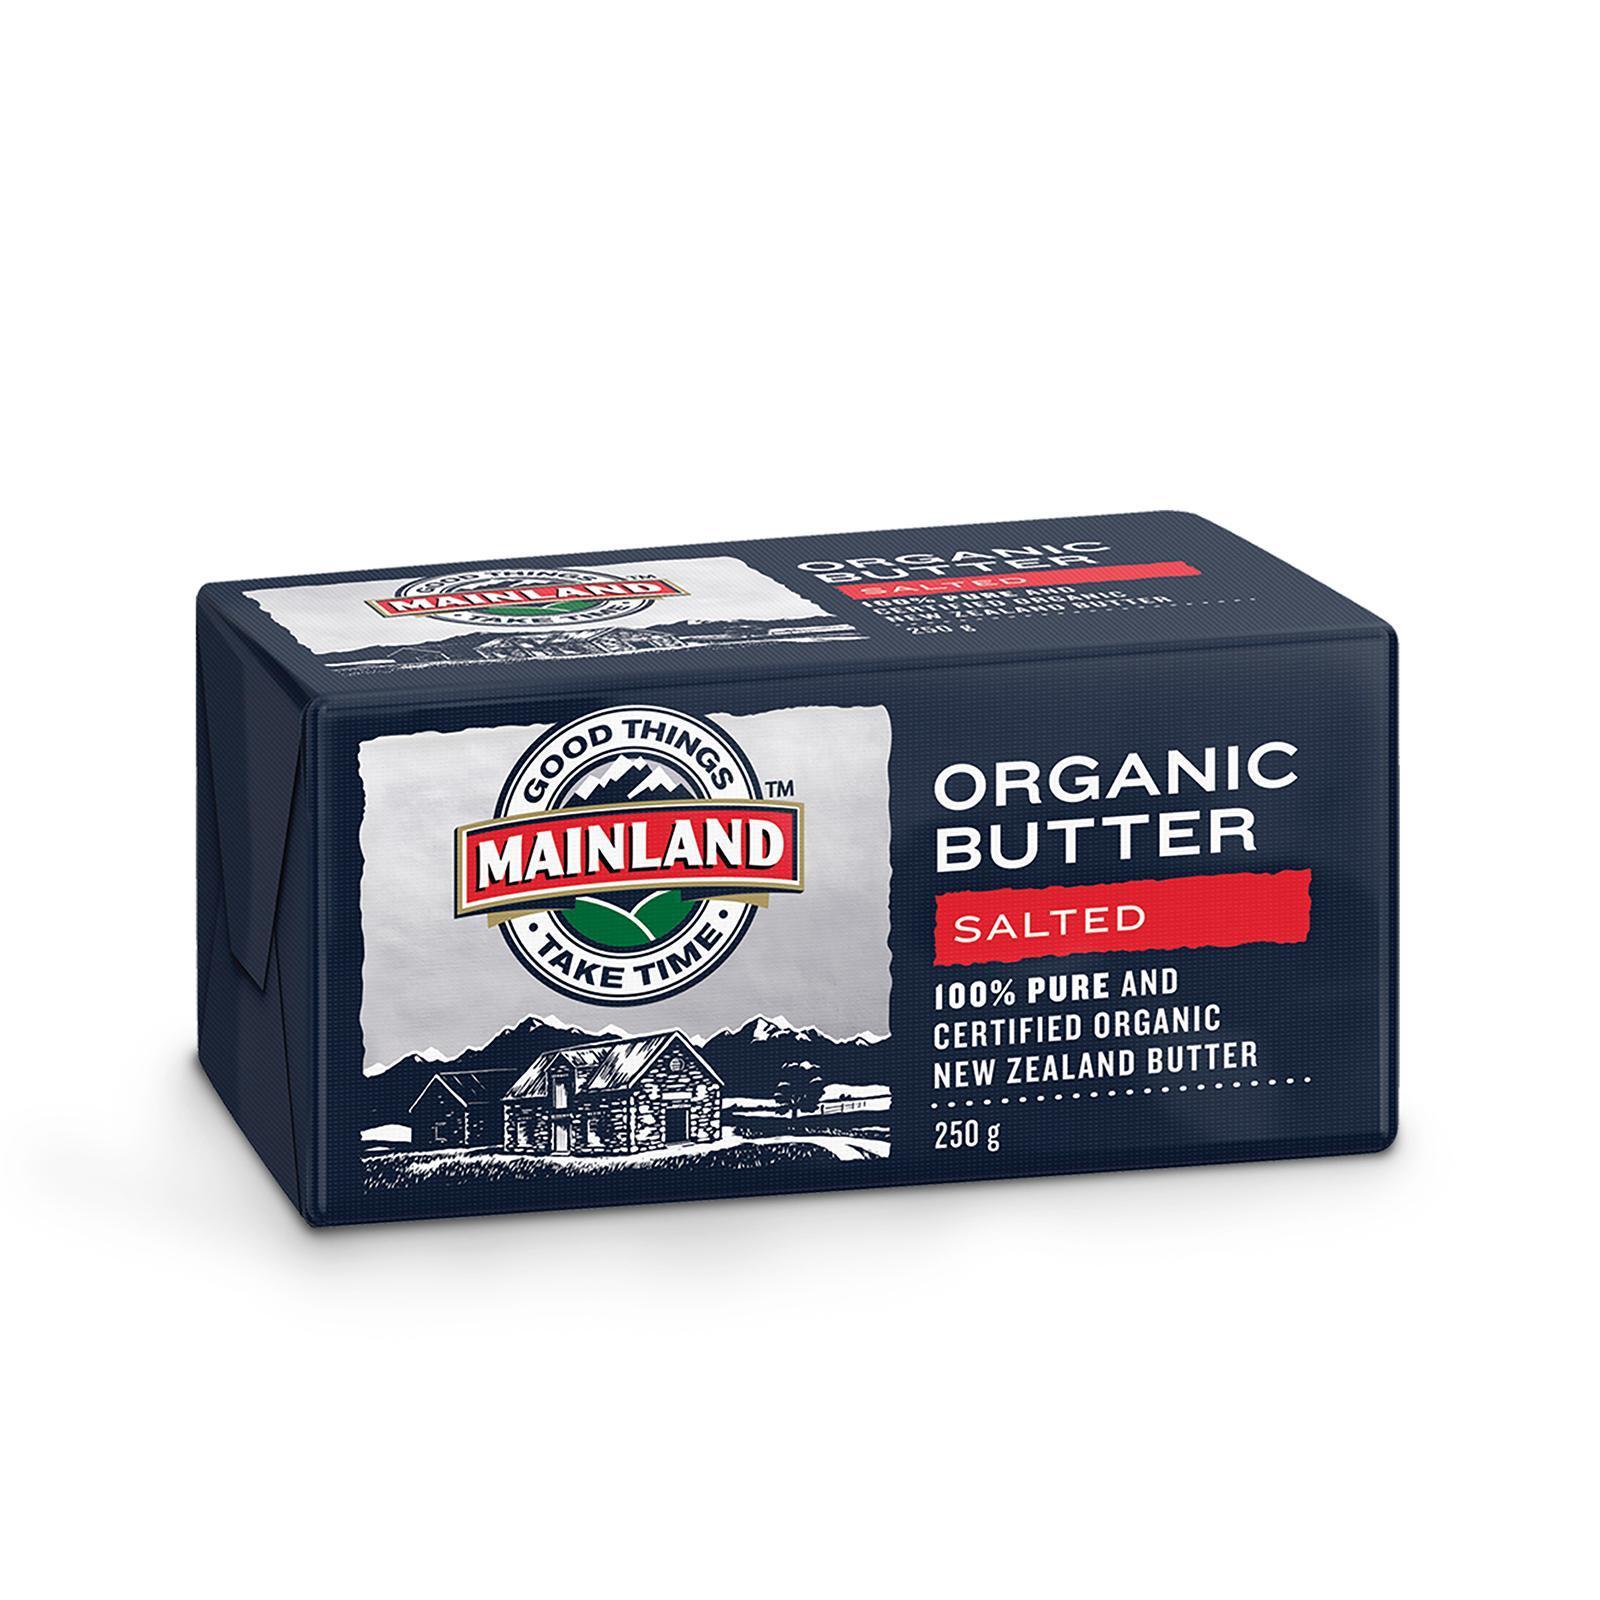 Mainland Salted Organic Butter 250g By Redmart.